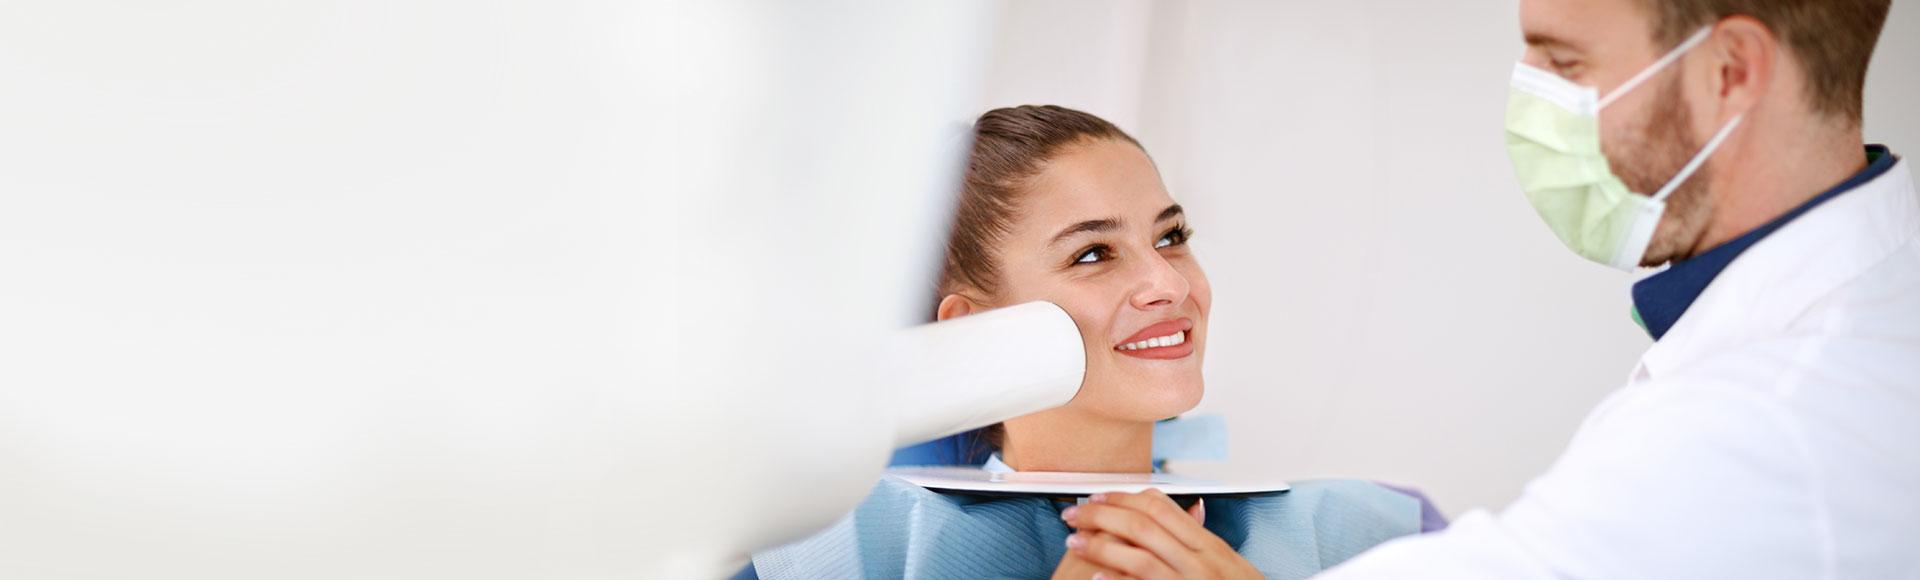 Wurzelentzuendung Endodontie Wurzelbehandlung Wurzelkanalbehandlung